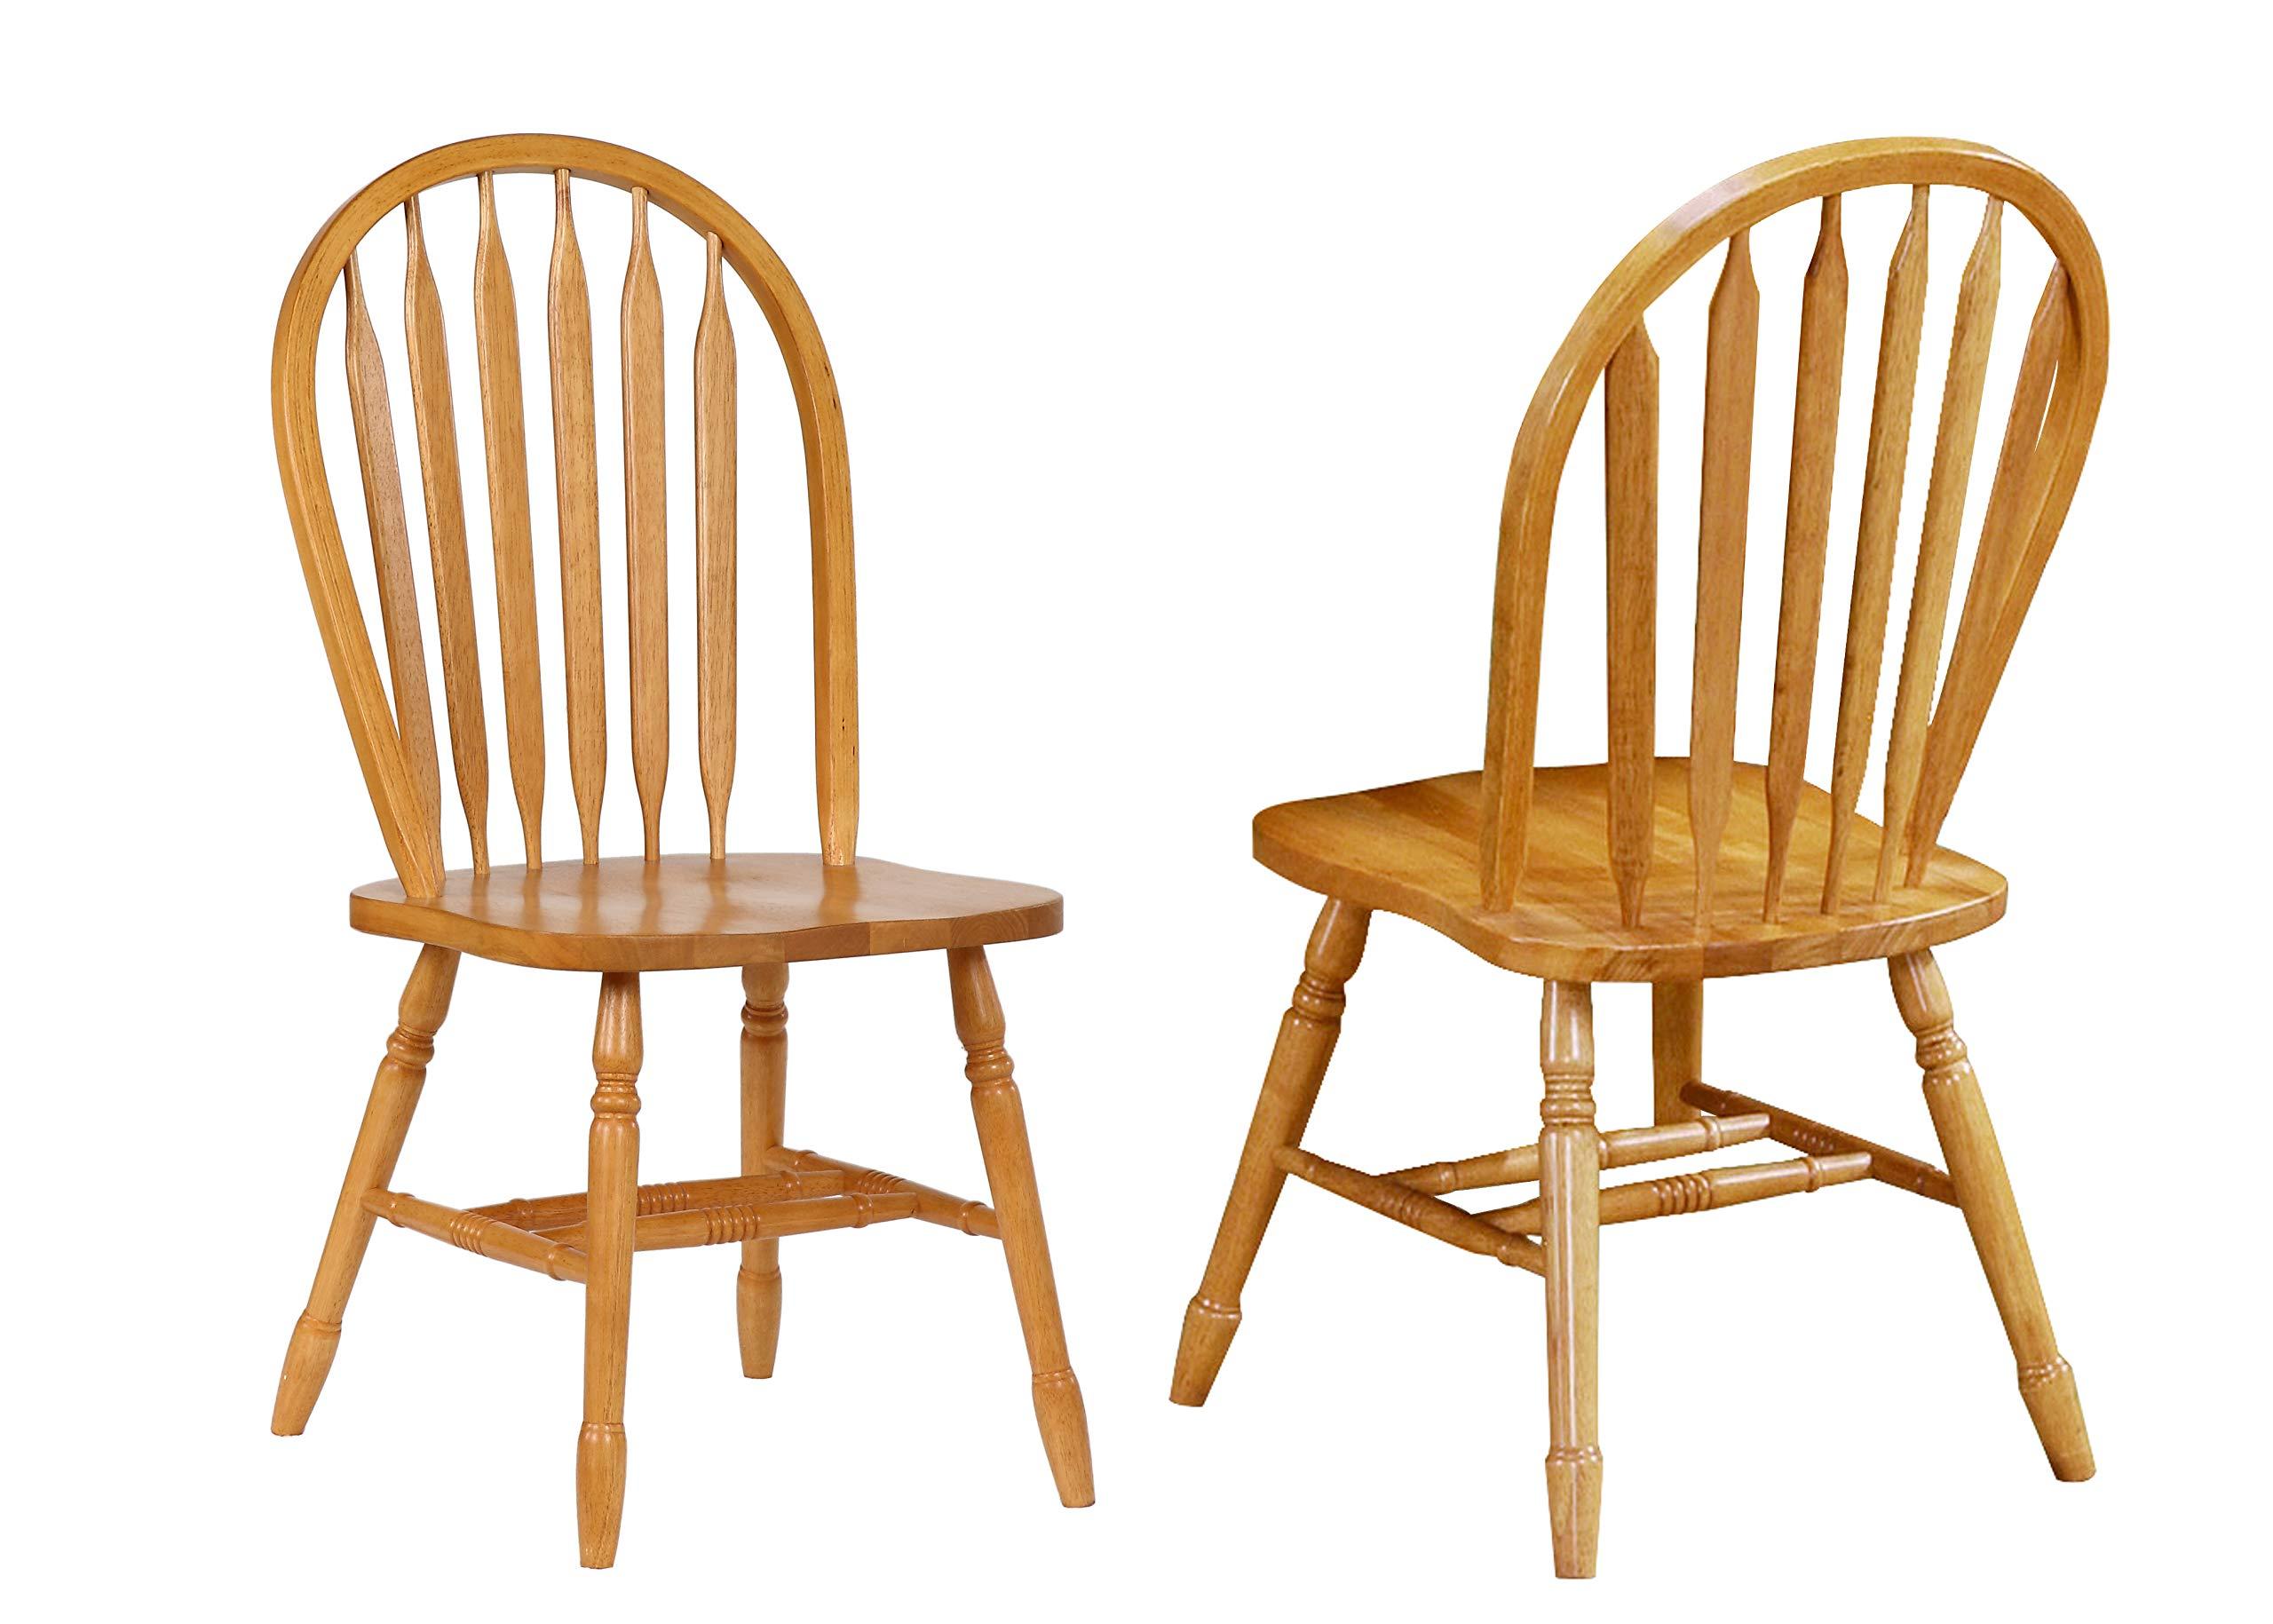 Sunset Trading Arrowback Dining Chair, Set of 2, 38'', Light Oak